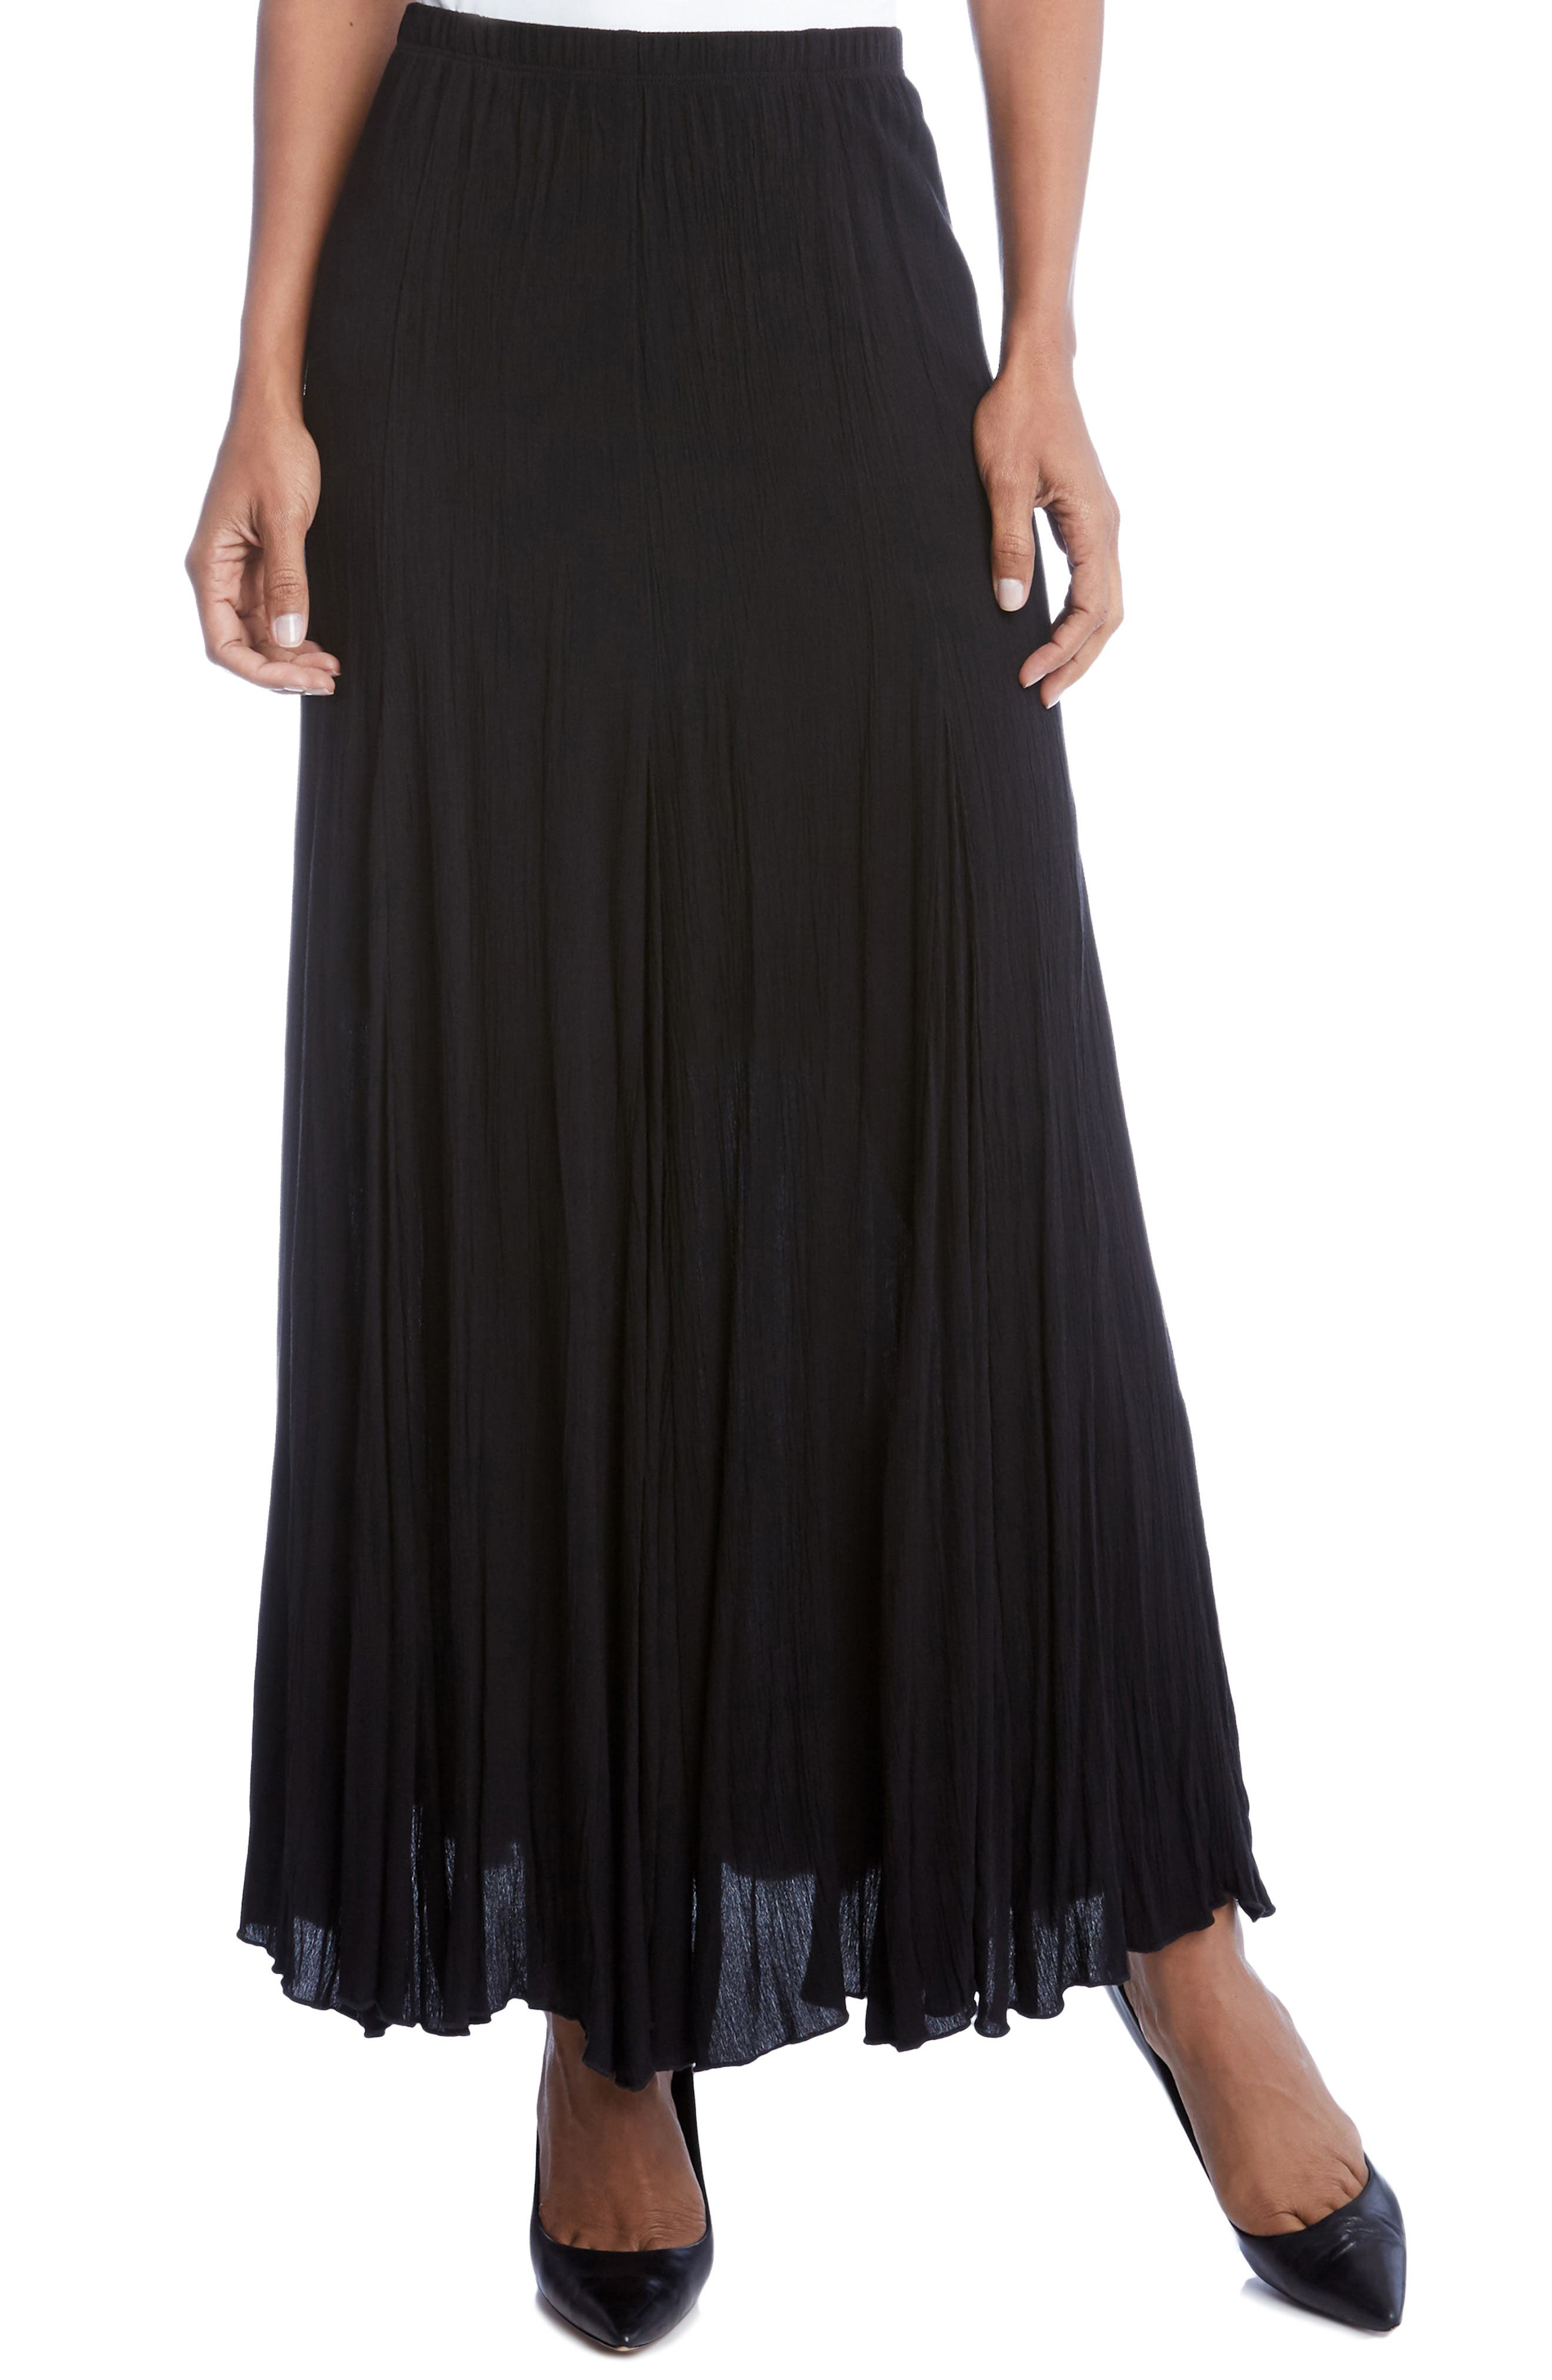 Alternate Image 1 Selected - Karen Kane Maxi Skirt